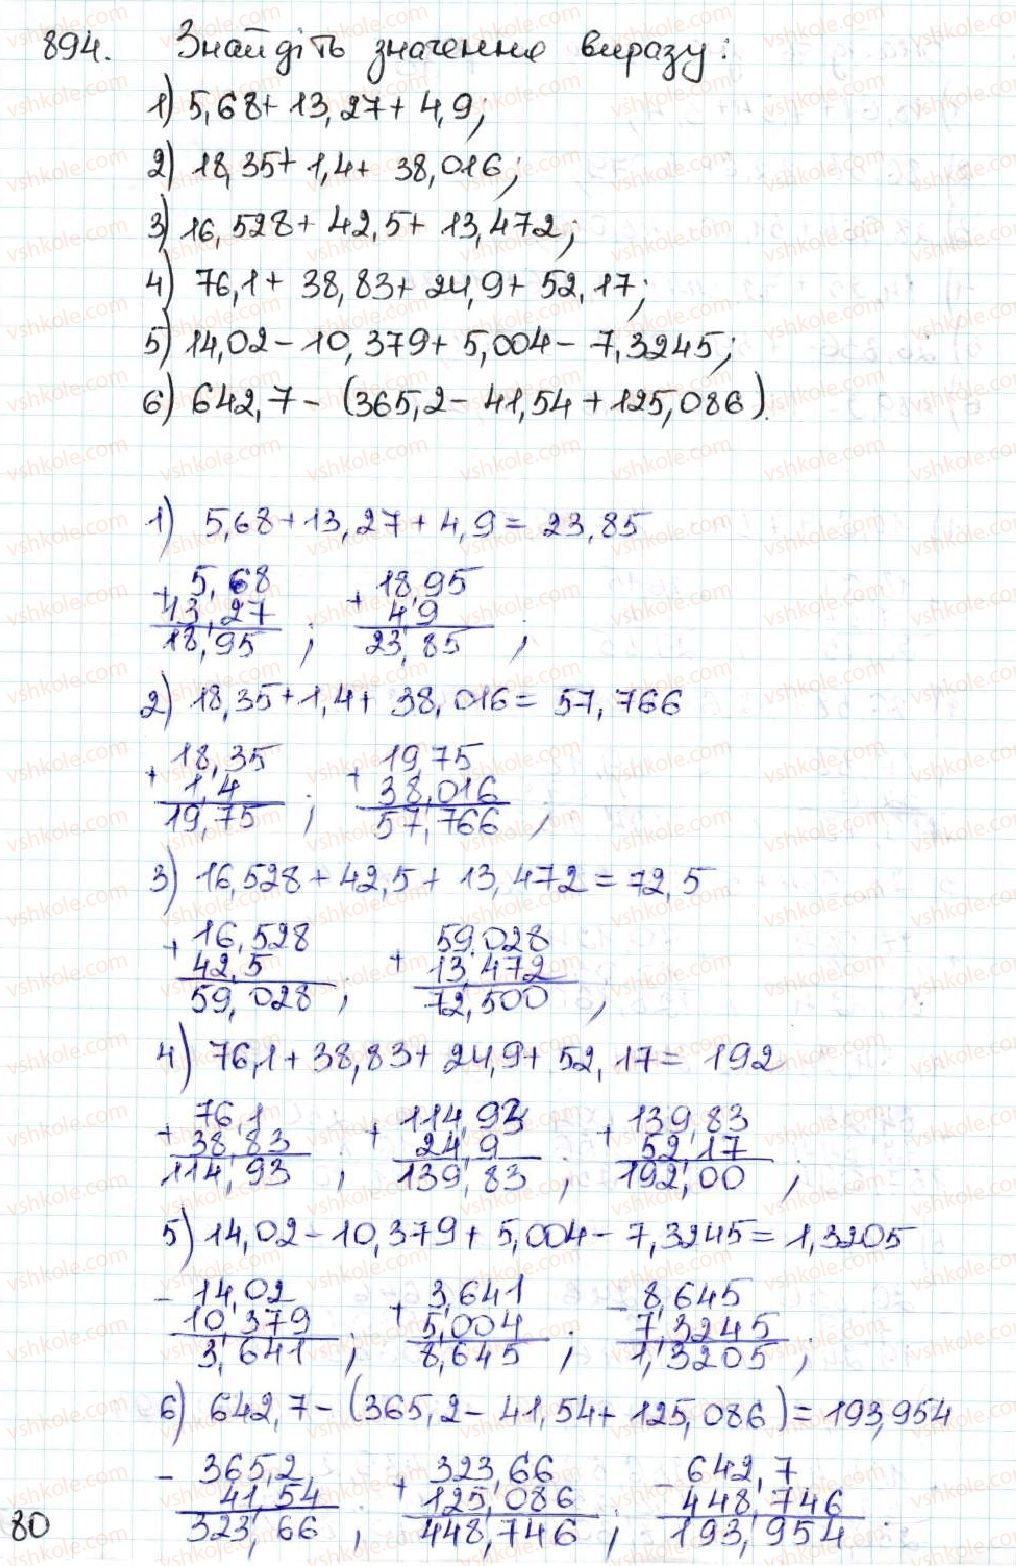 5-matematika-ag-merzlyak-vb-polonskij-ms-yakir-2013--5-desyatkovi-drobi-33-dodavannya-i-vidnimannya-desyatkovih-drobiv-894.jpg